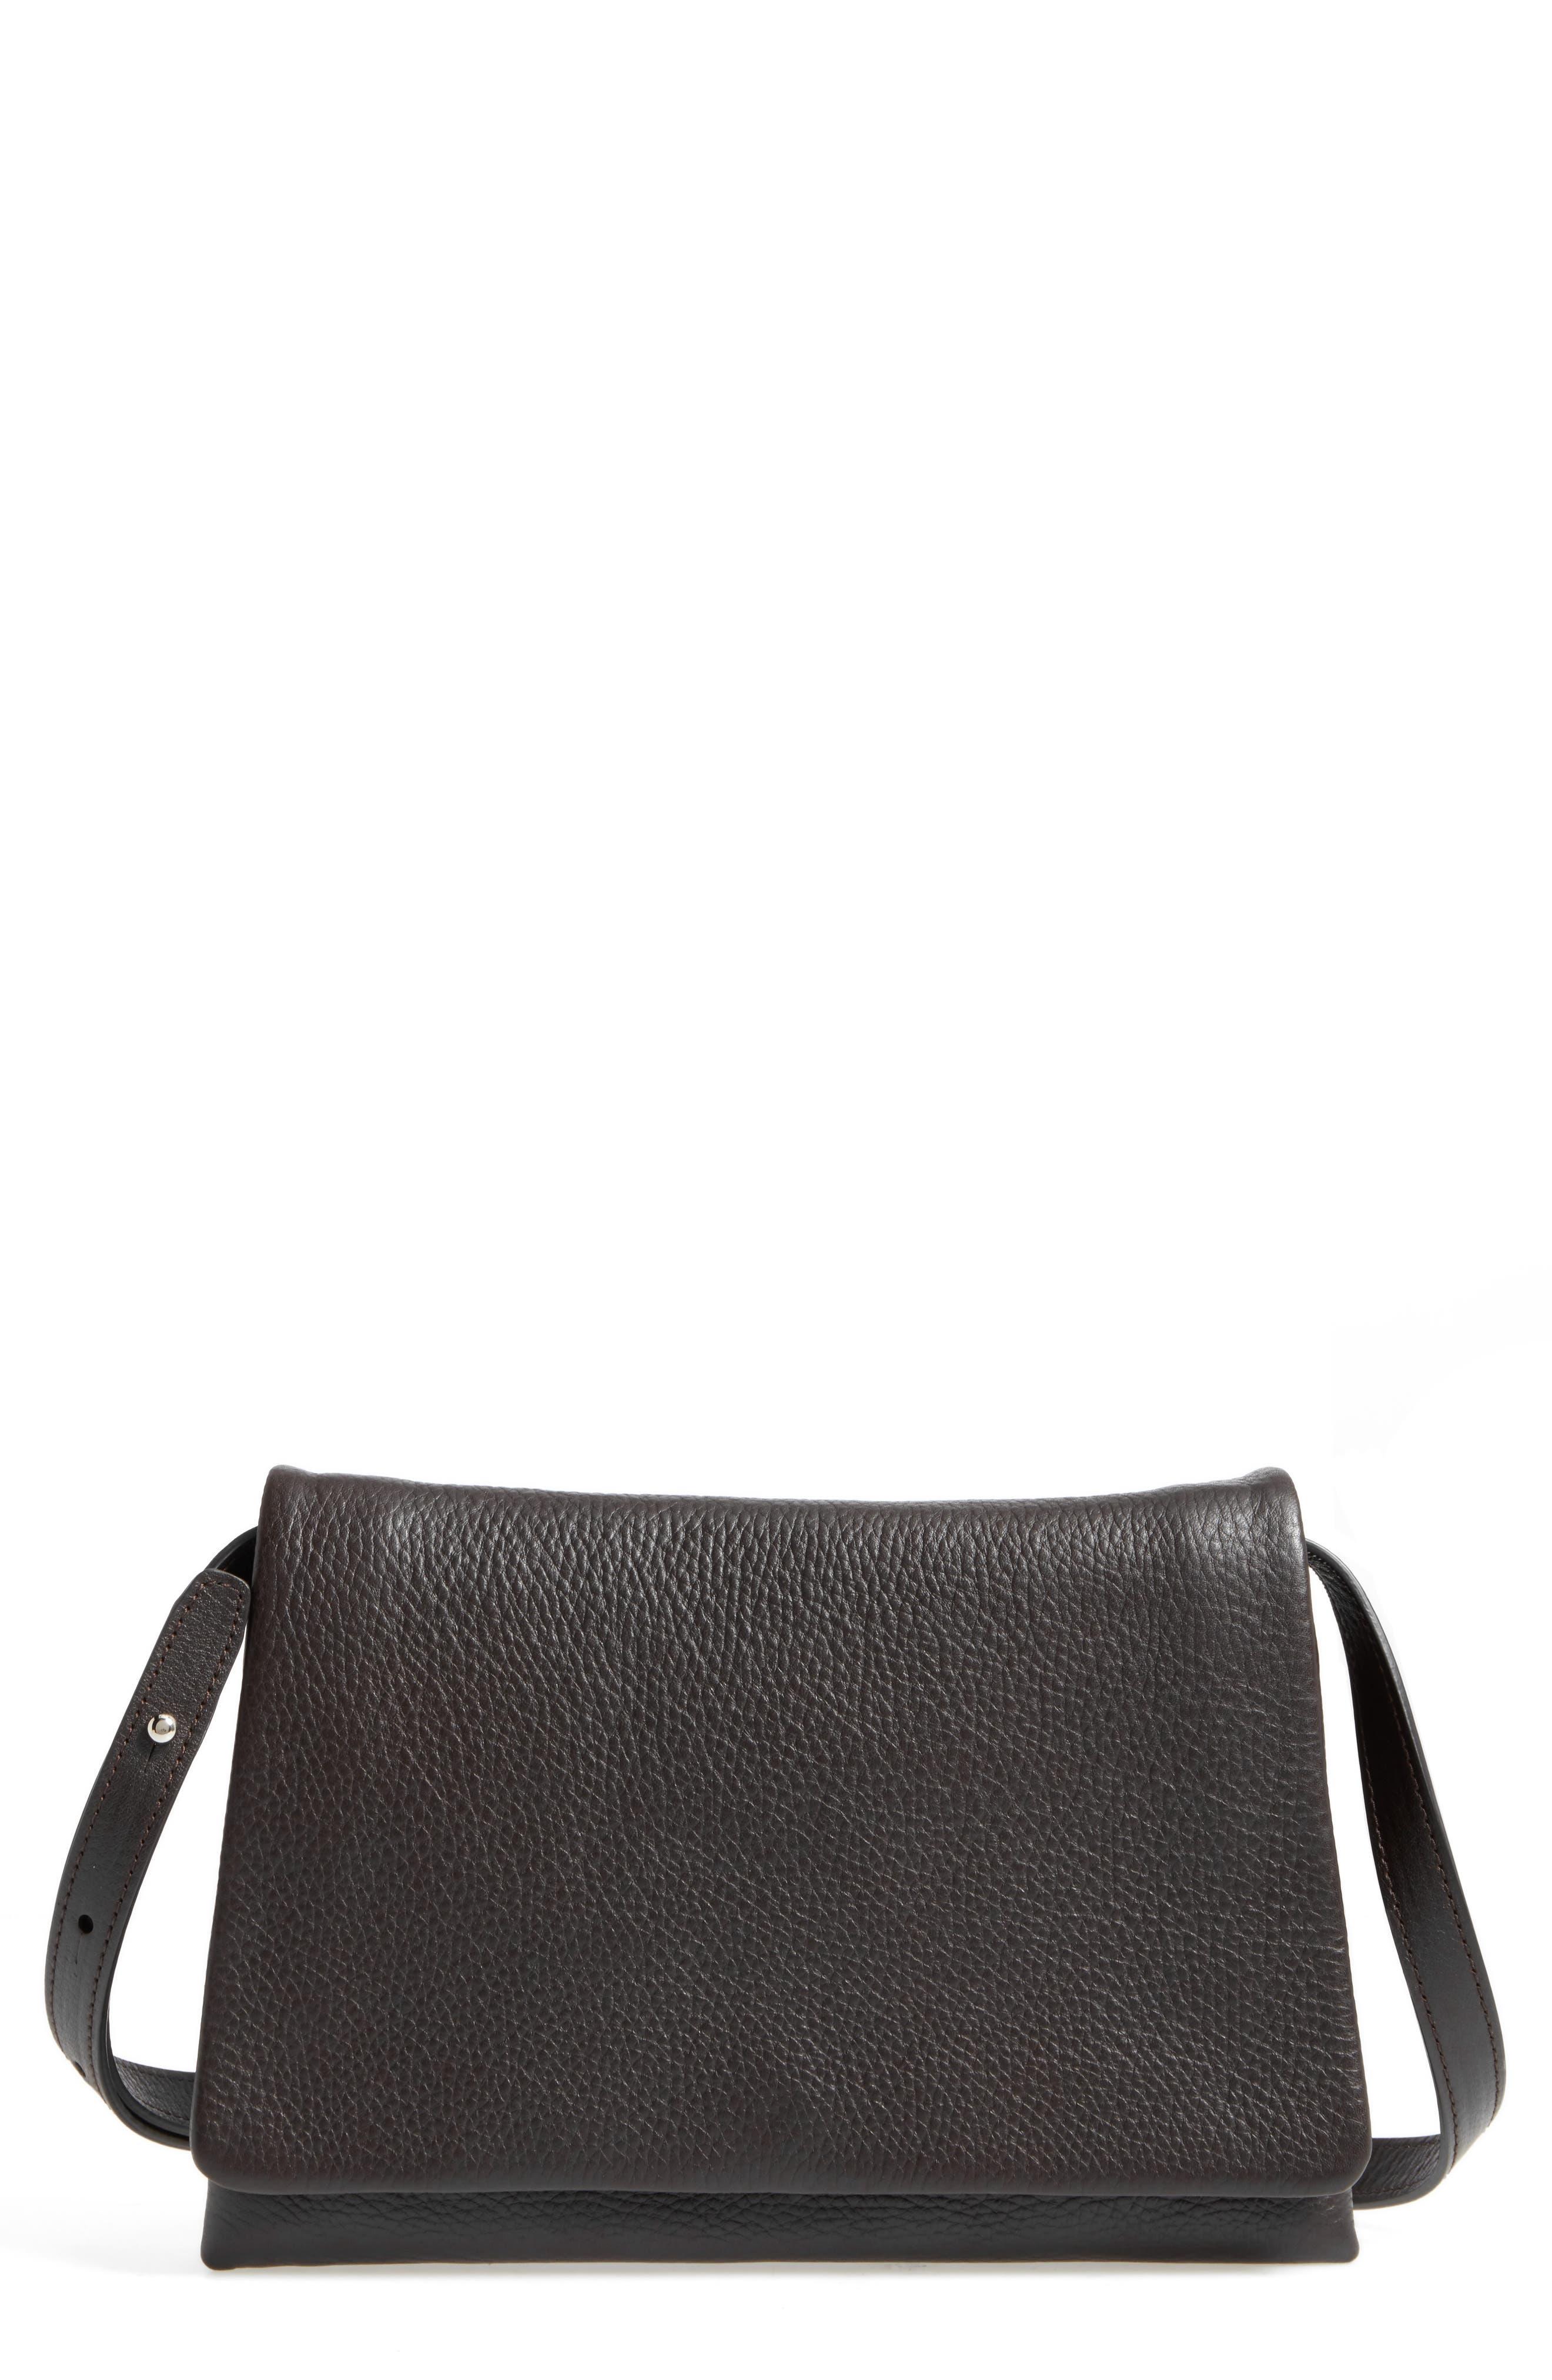 Leather Convertible Shoulder Bag,                             Main thumbnail 1, color,                             Deep Brown